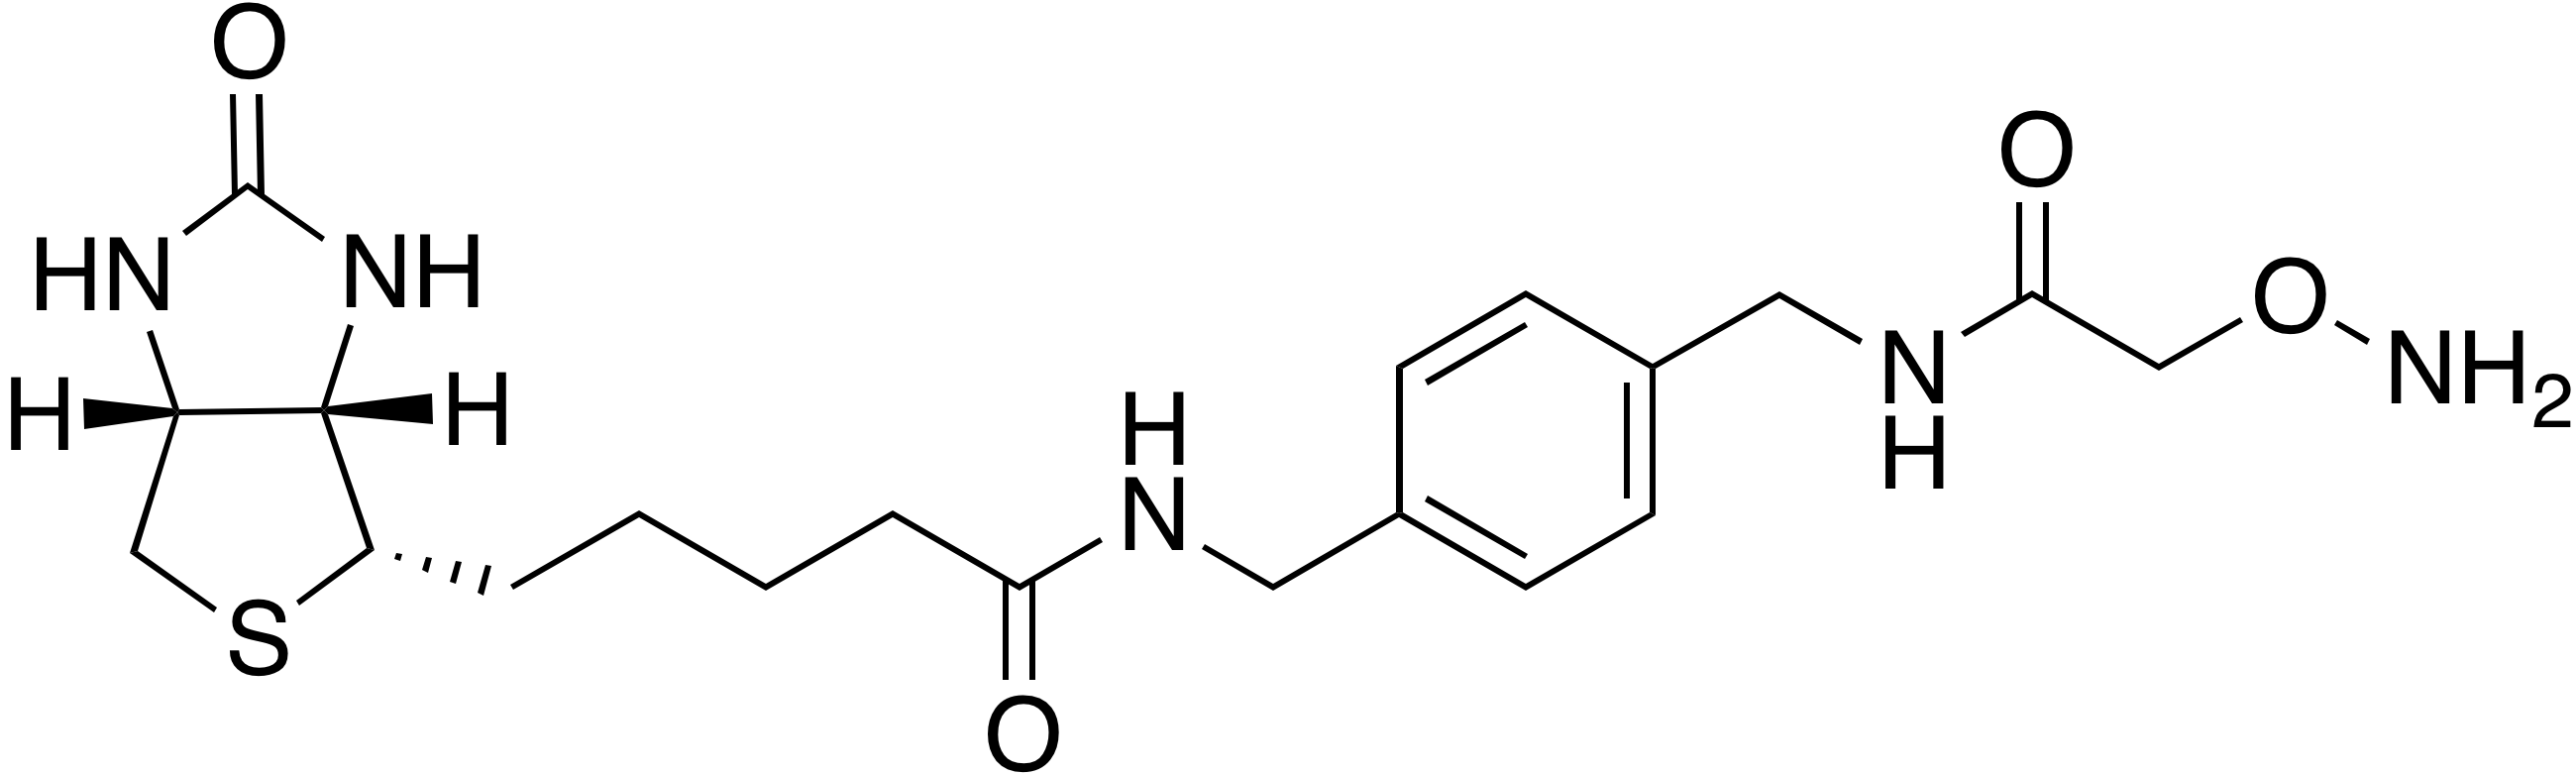 N-(4-(Aminoxyacetamidomethyl)benzyl)-biotinamide